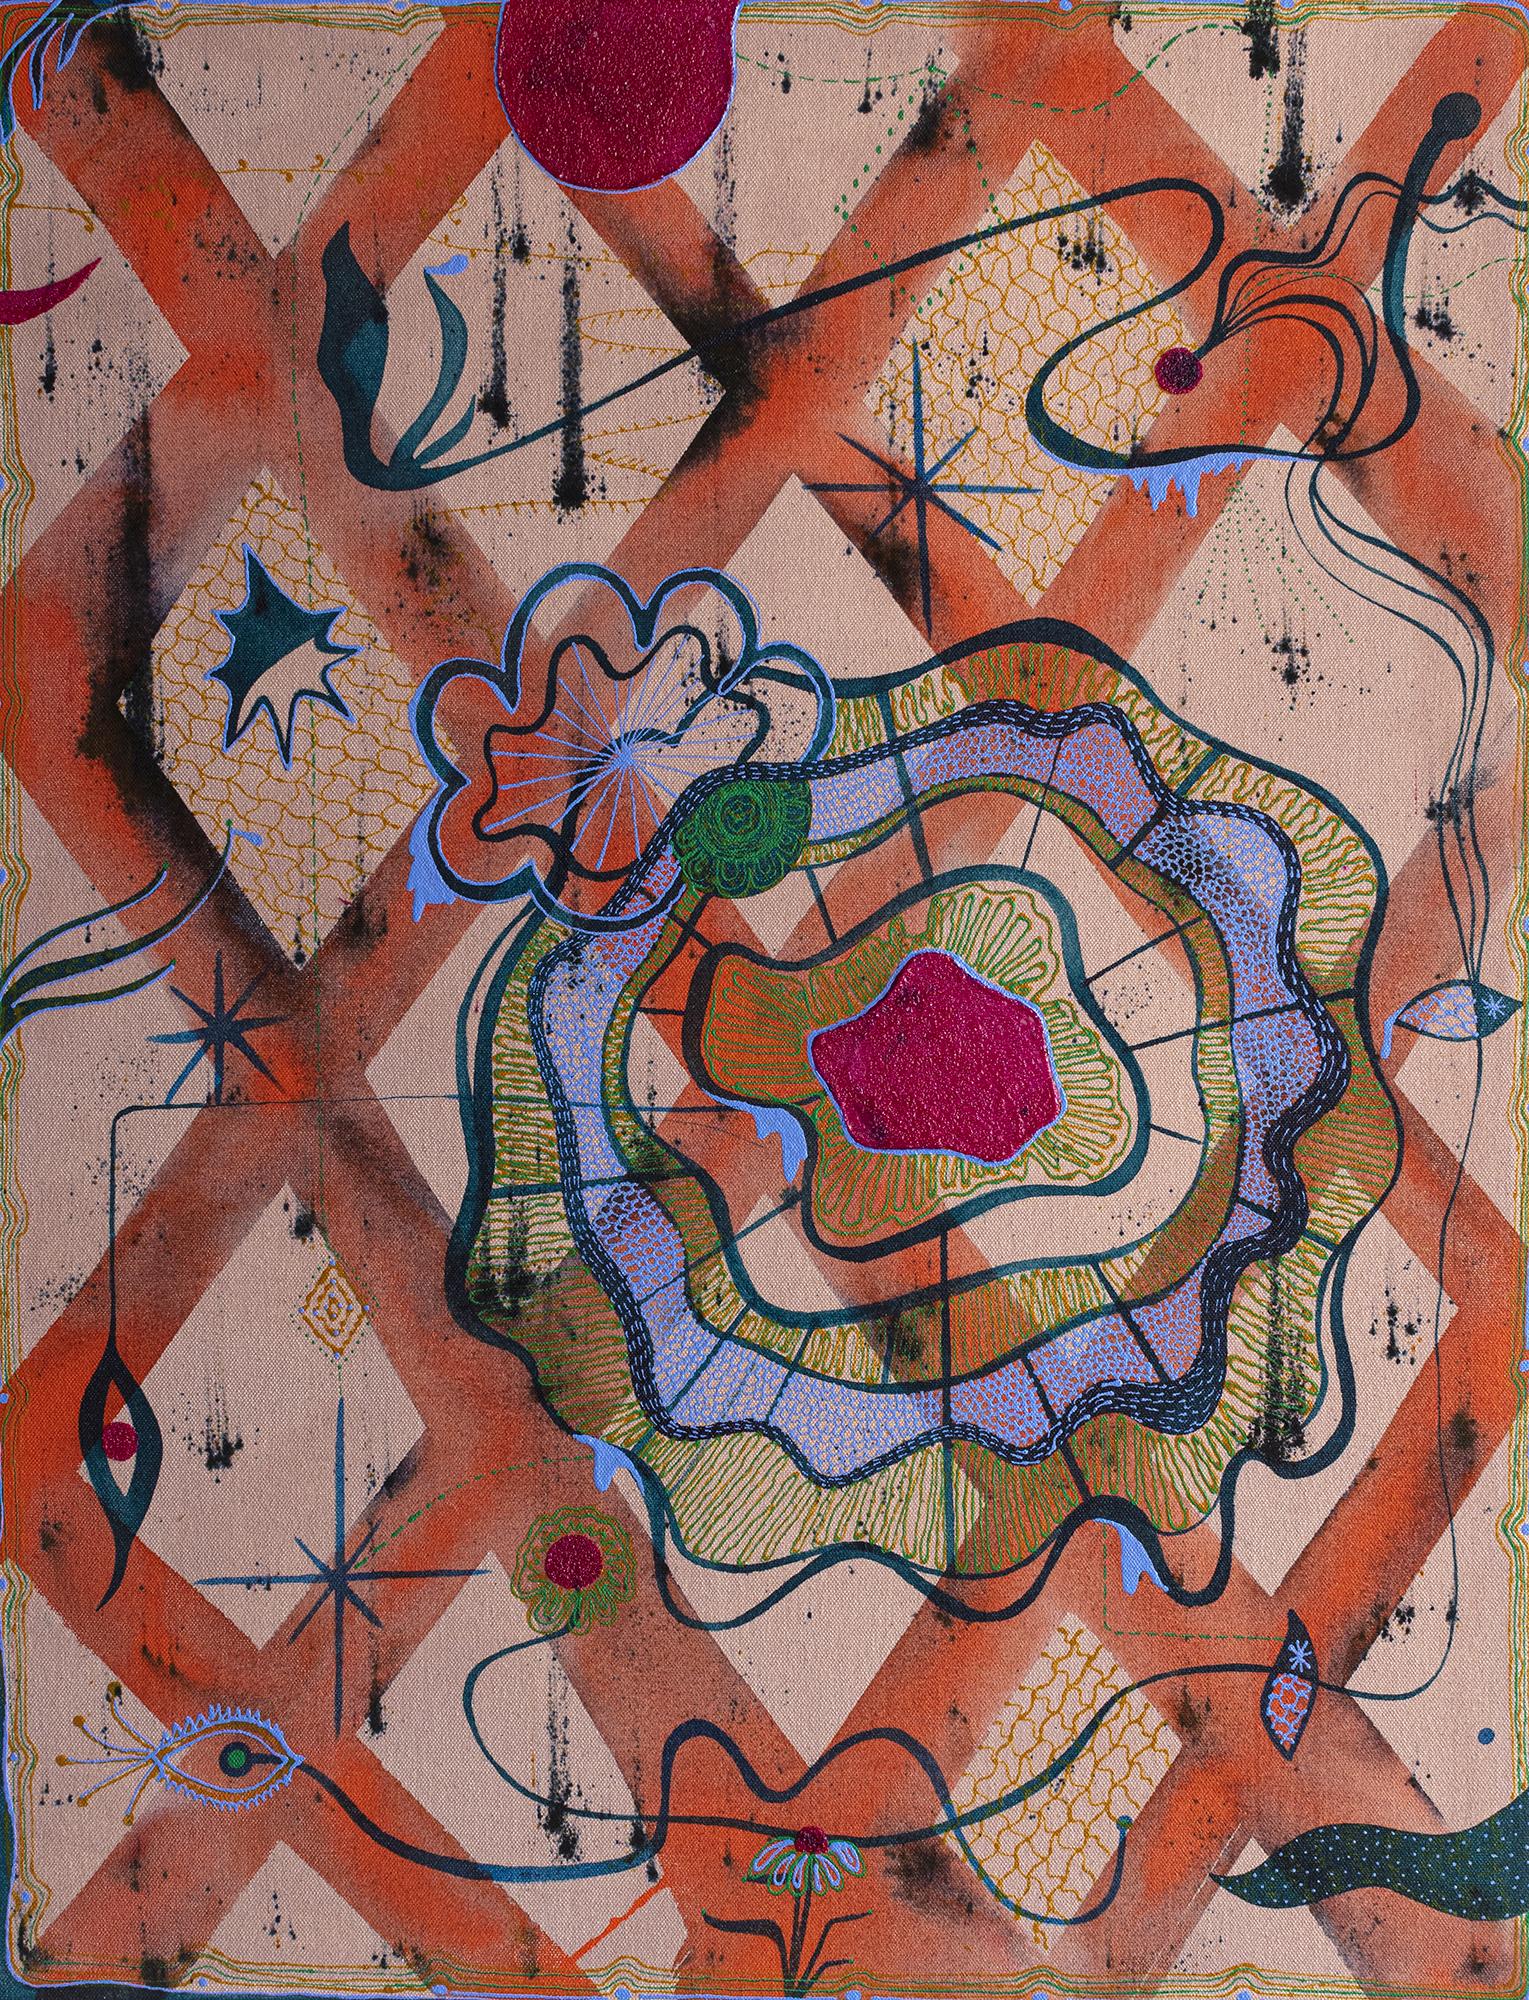 Natessa Amin,  A Web that Warns , 2019. Acrylic on canvas, 20 x 26 inches.